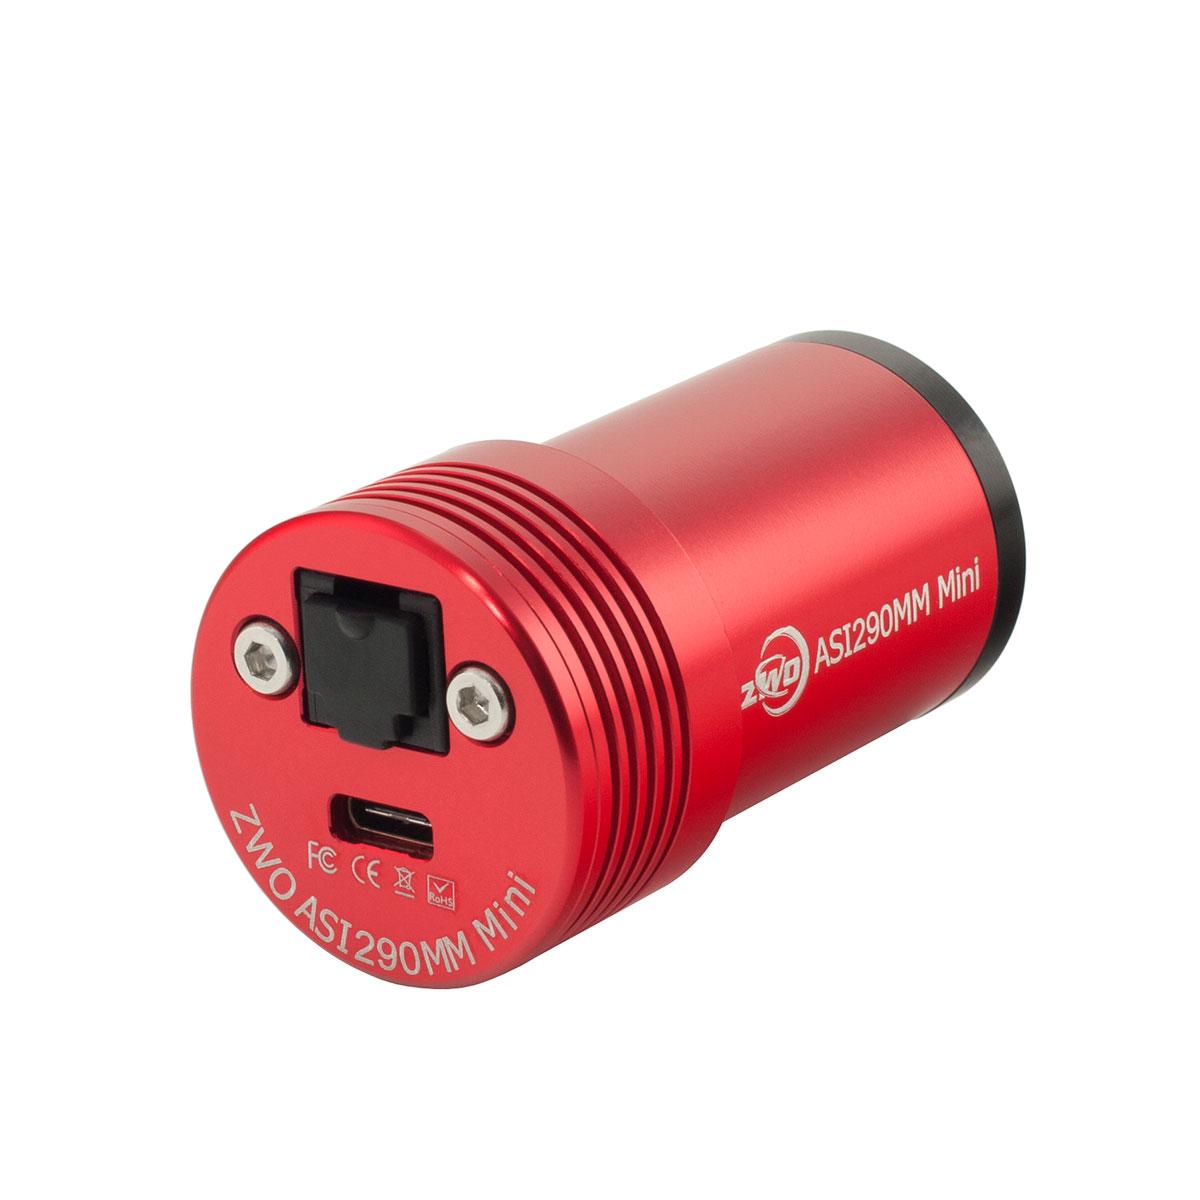 ZWO ASI 290MM Mini USB 2 0 Mono Camera